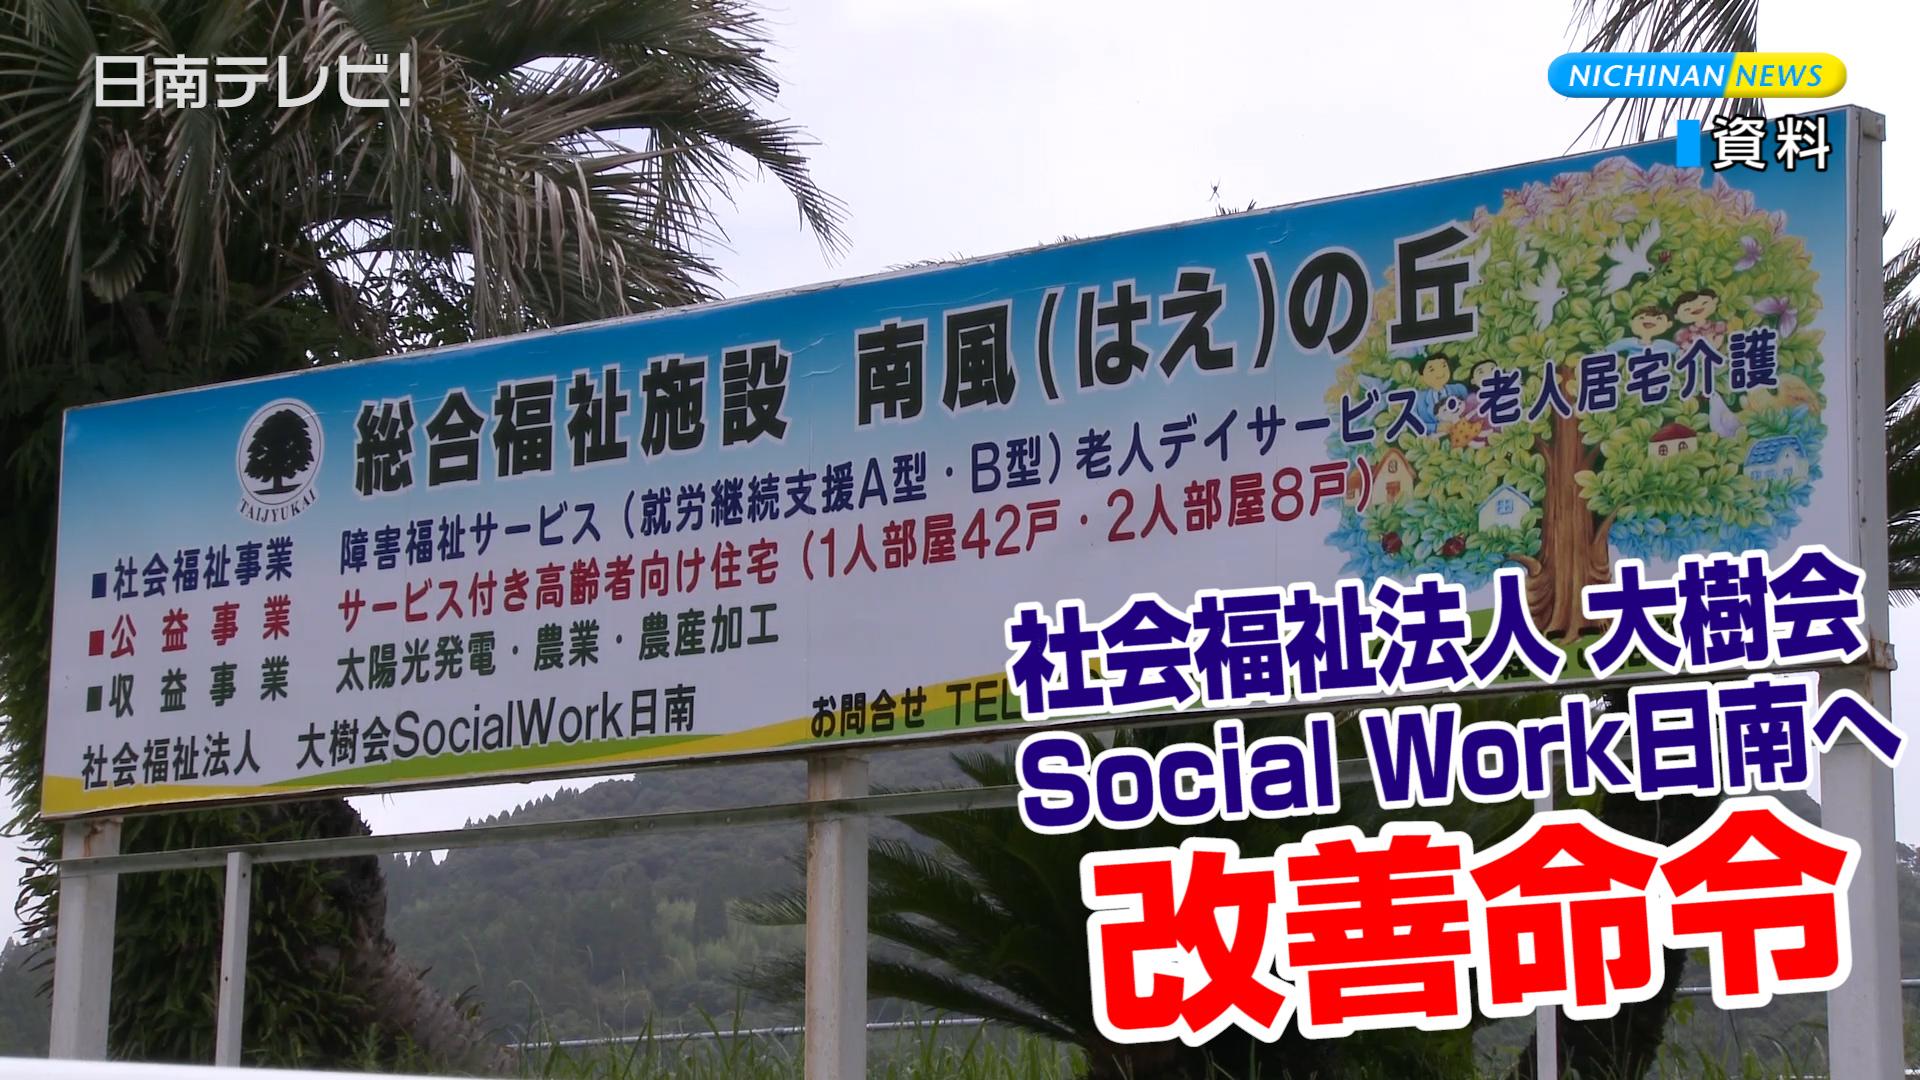 大樹会Social Work日南に改善命令